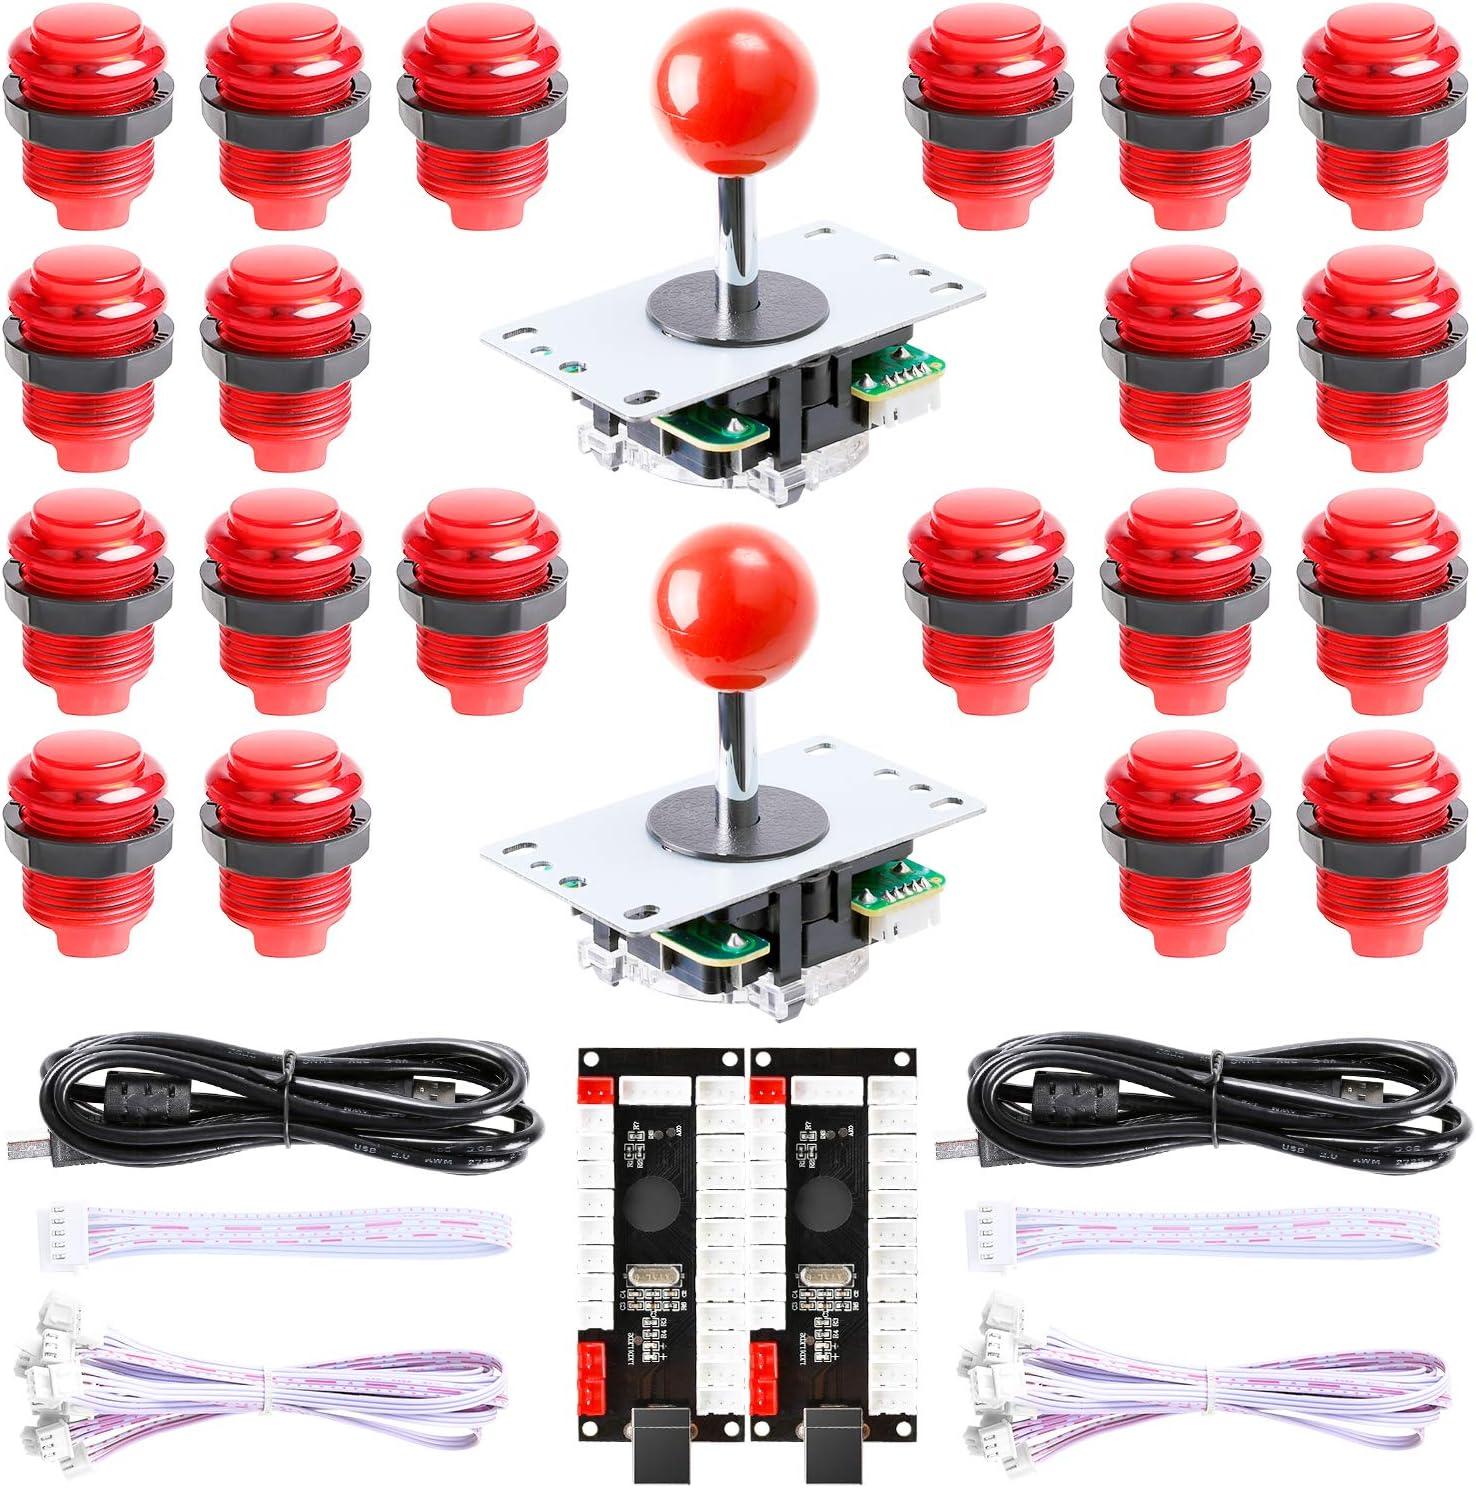 Hikig New Updated Version 2-Player LED Arcade DIY Kit - 2X Zero Delay LED USB Encoder + 2X Arcade Joystick + 20x LED Arcade Buttons for MAME, PC, Windows, Raspberry Pi, Arcade1Up (All Red Kit)